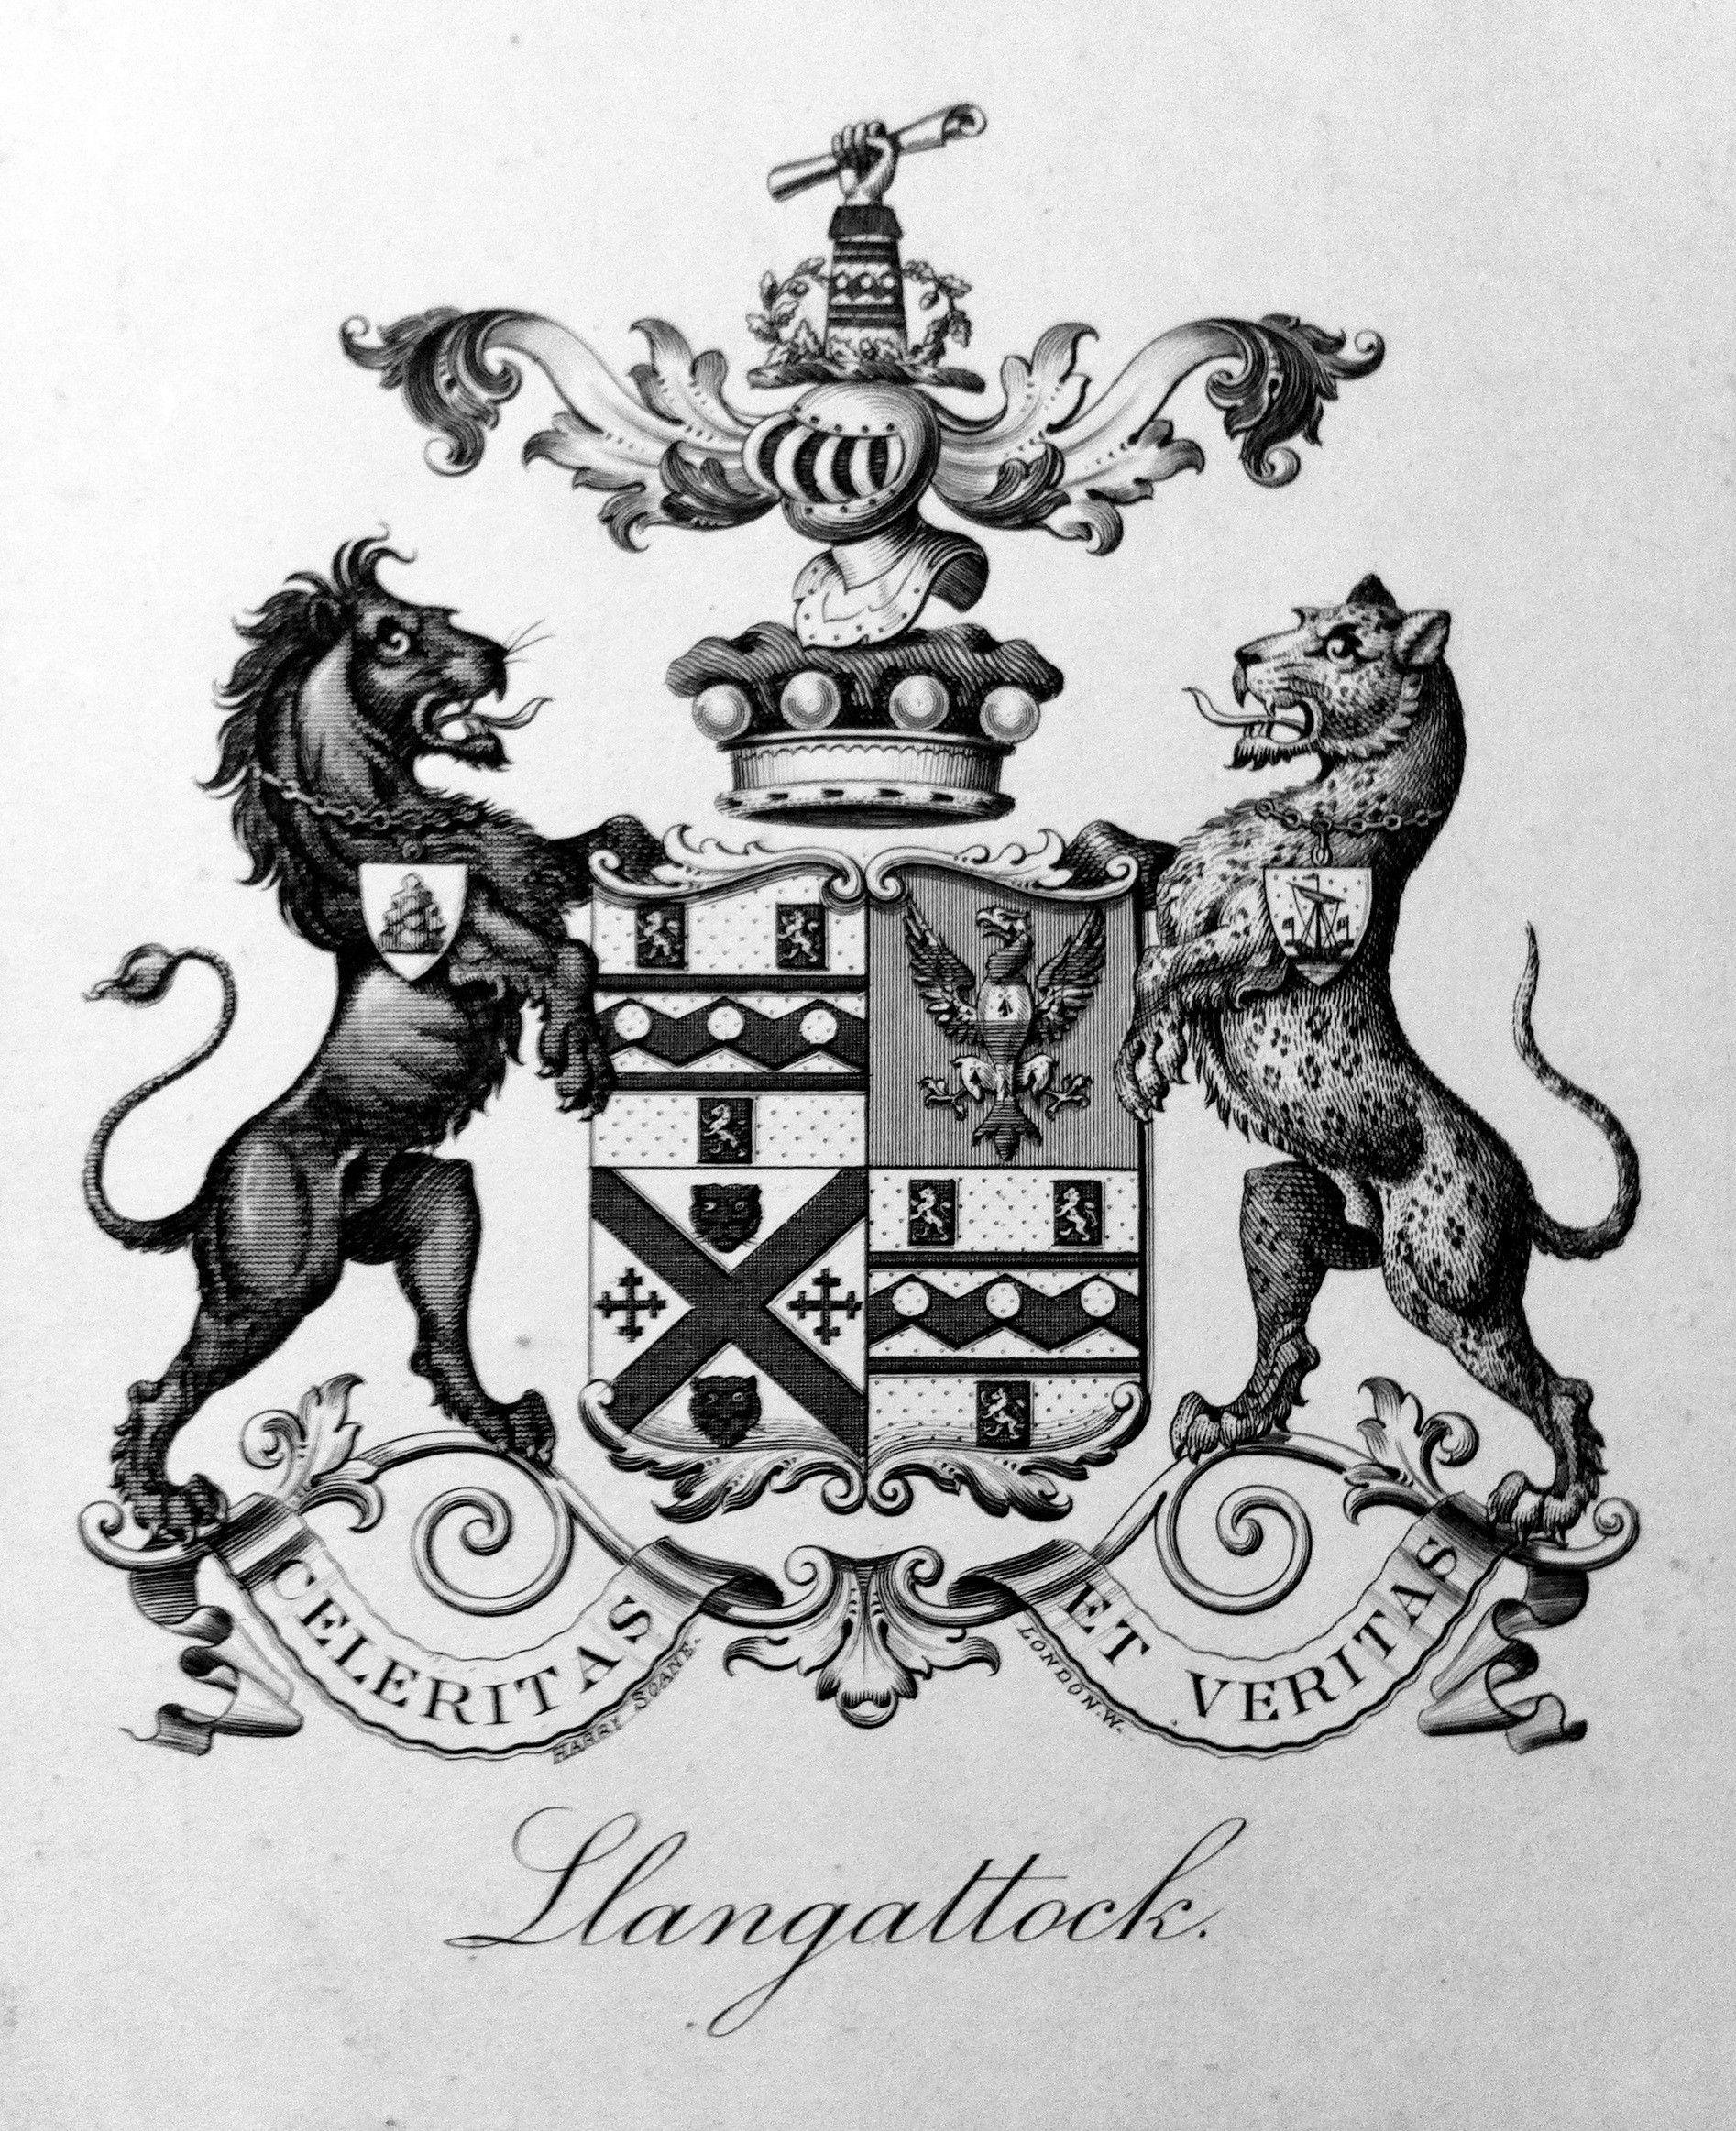 Httpuploadmediawikipediaen44cllangattockcrest httpuploadmediawikipediaen4 medieval symbolsfamily crest biocorpaavc Gallery